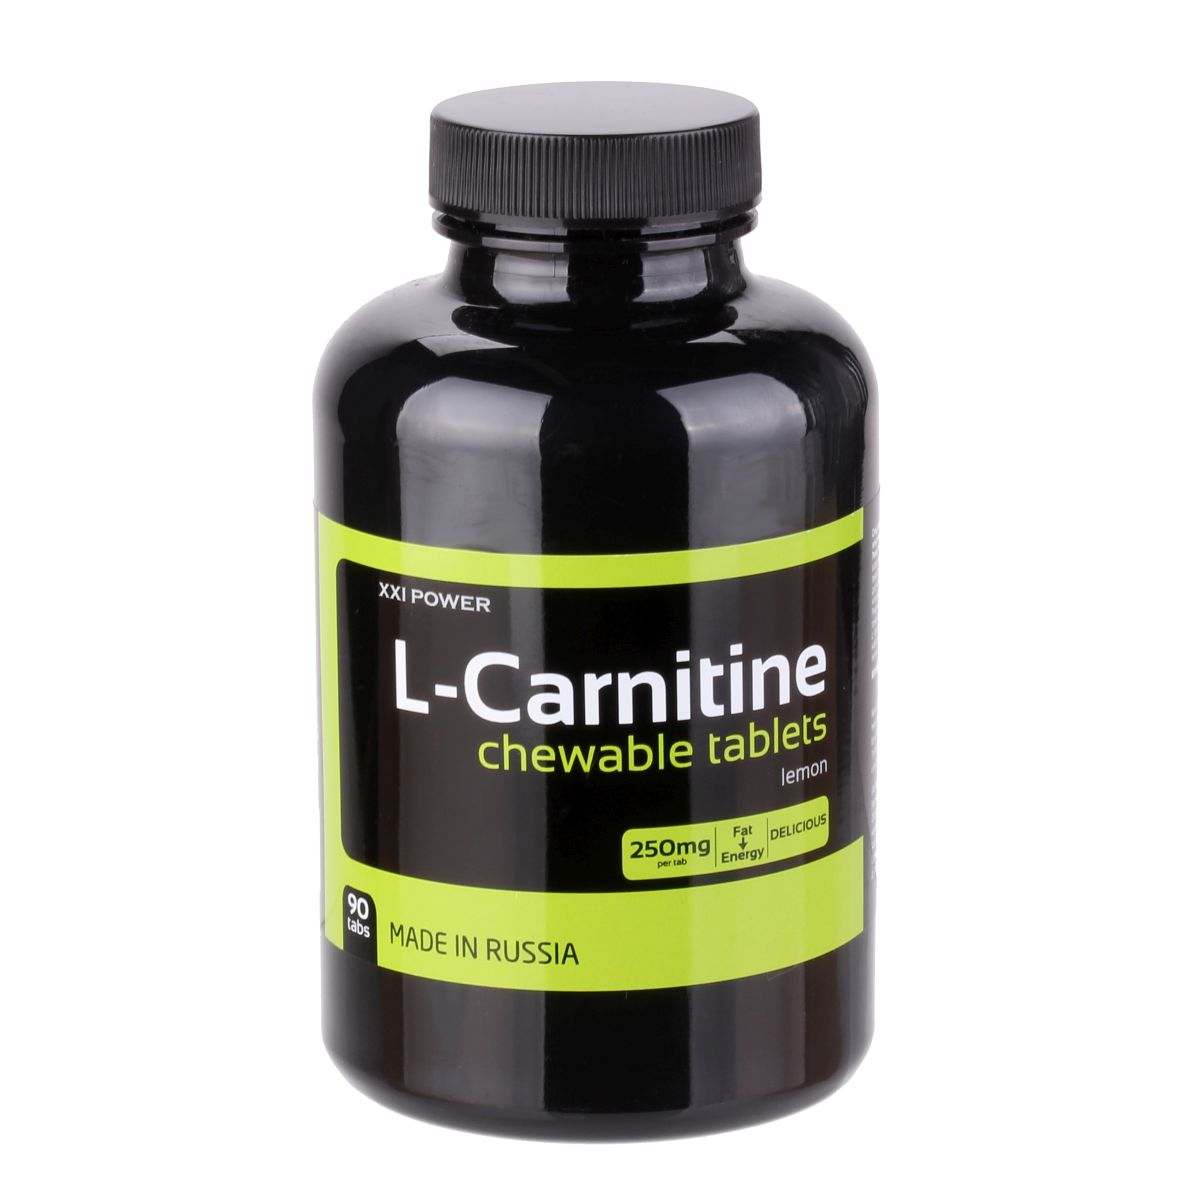 Жевательные таблетки ХХI Power L-карнитин, цитрус, 90 таблеток синглон 5мг 28 таблетки жевательные